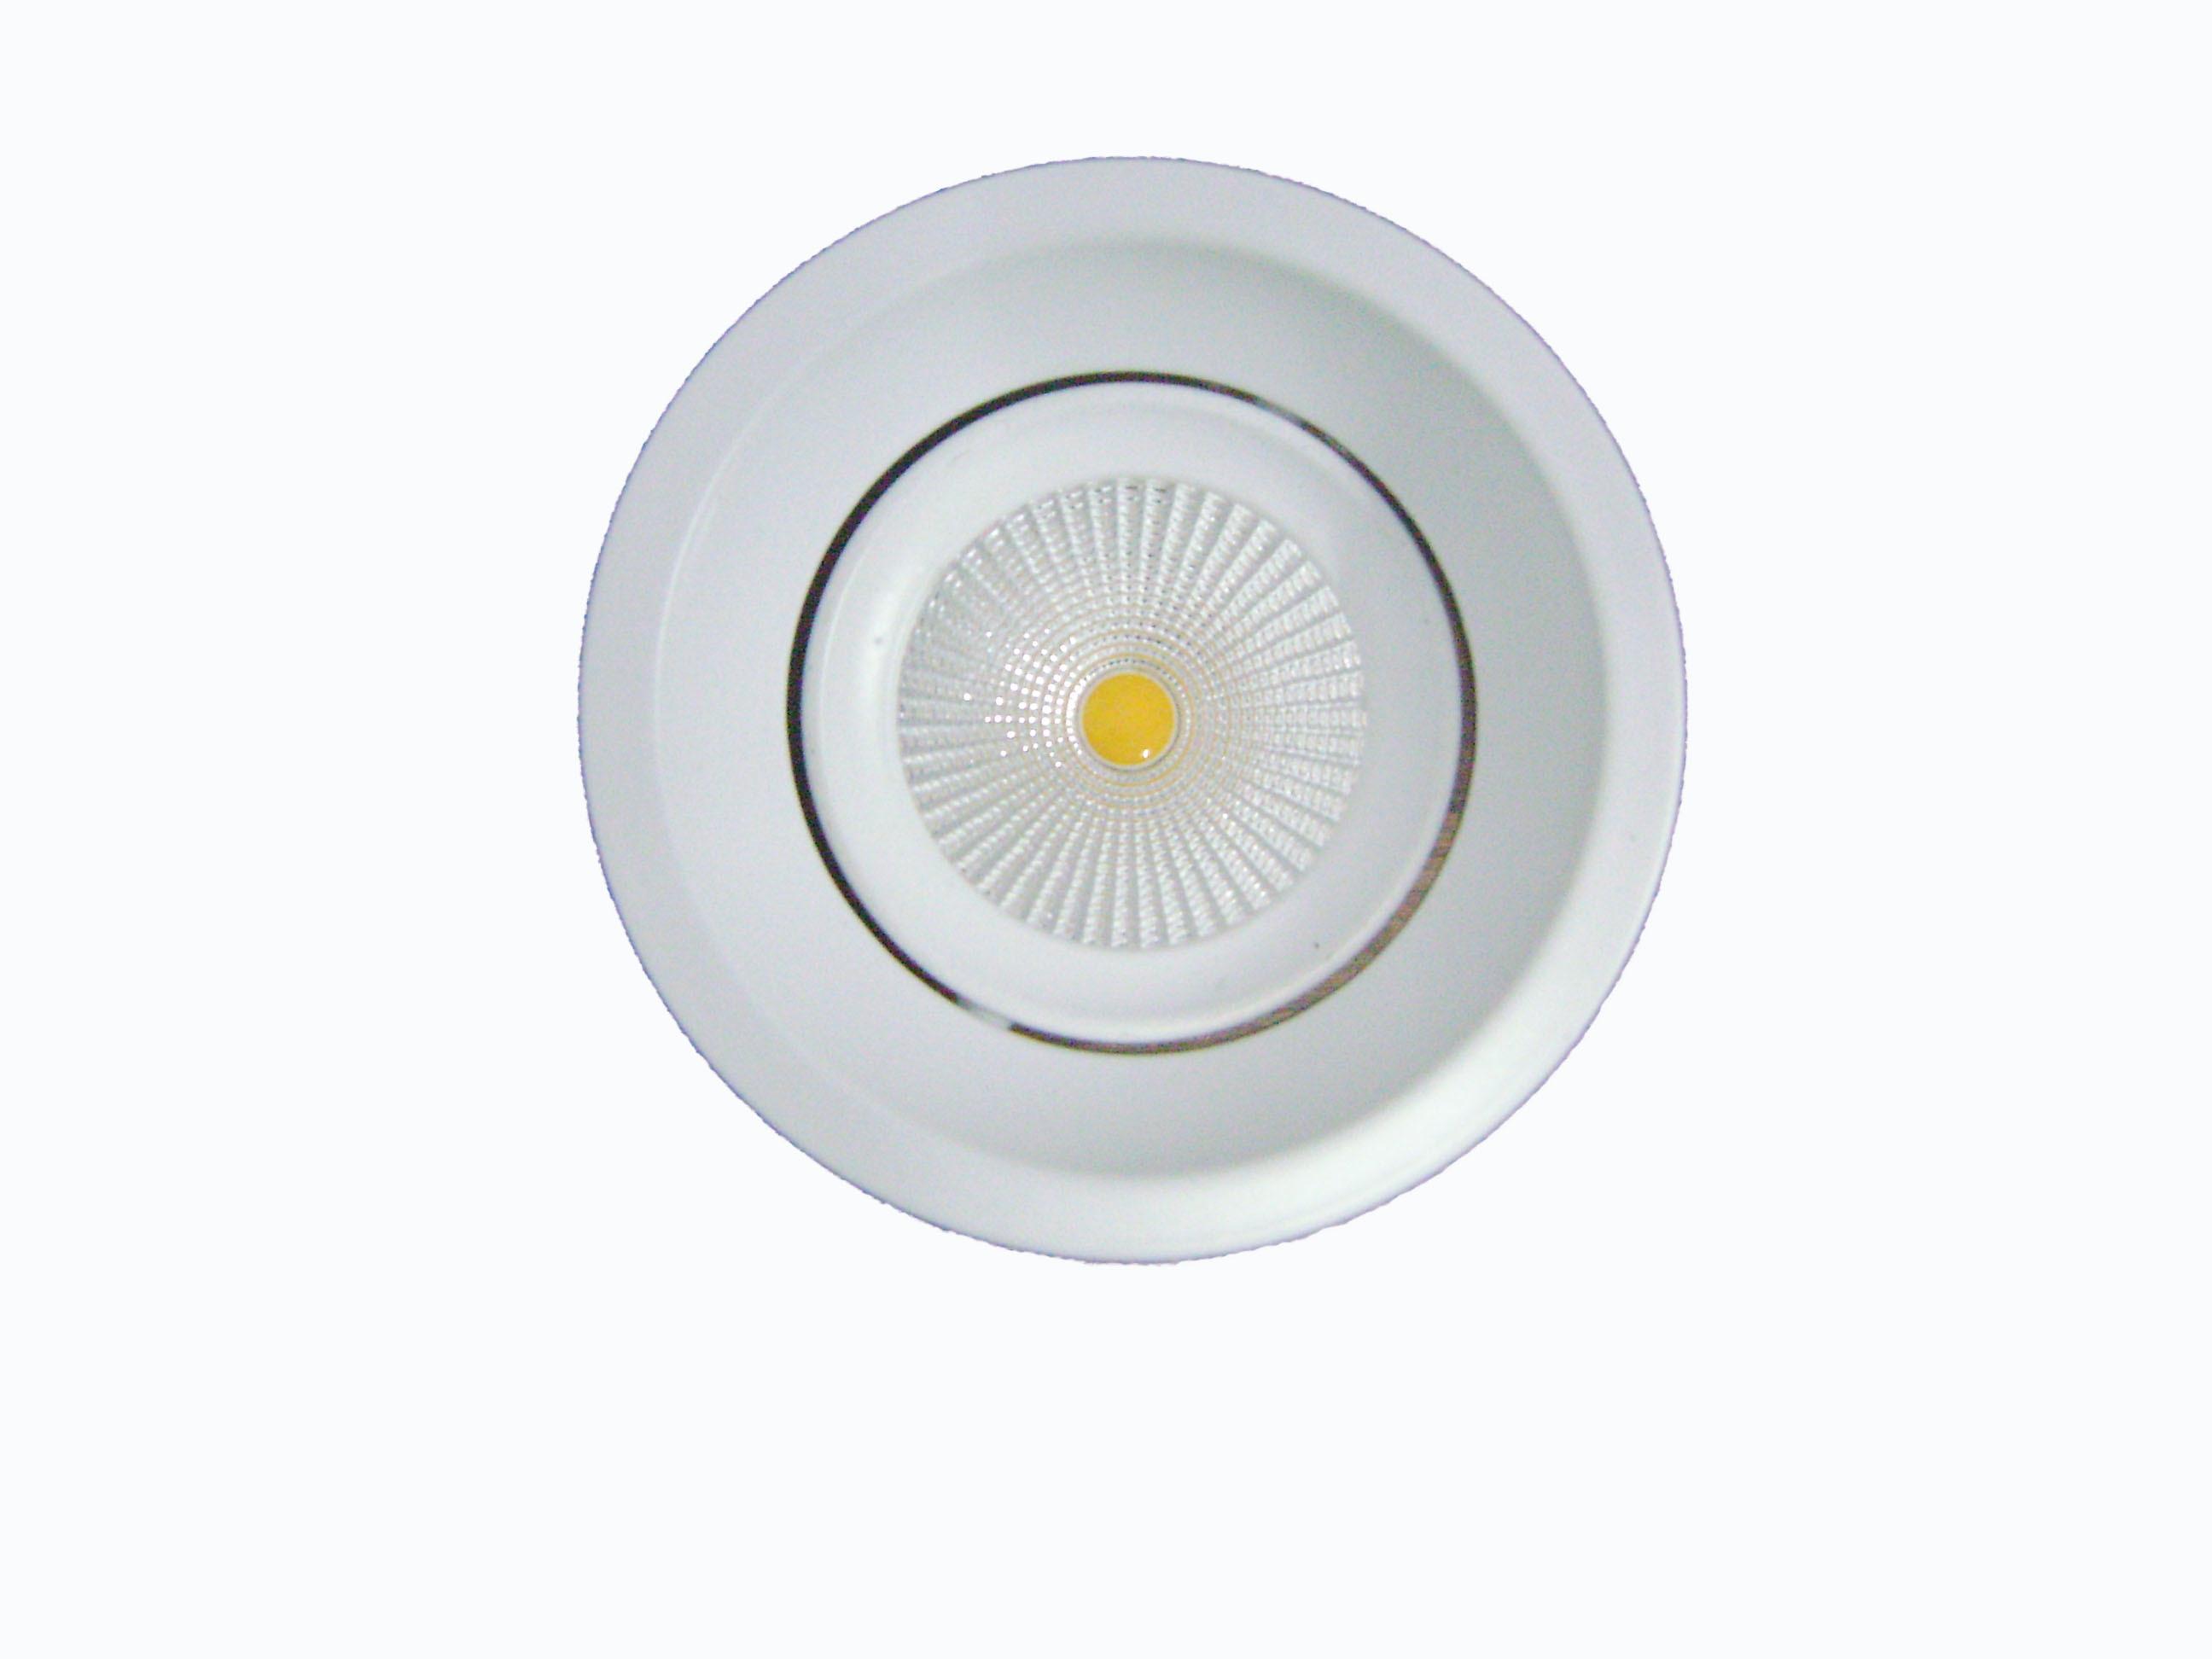 10 W ROUND SPORT LIGHT